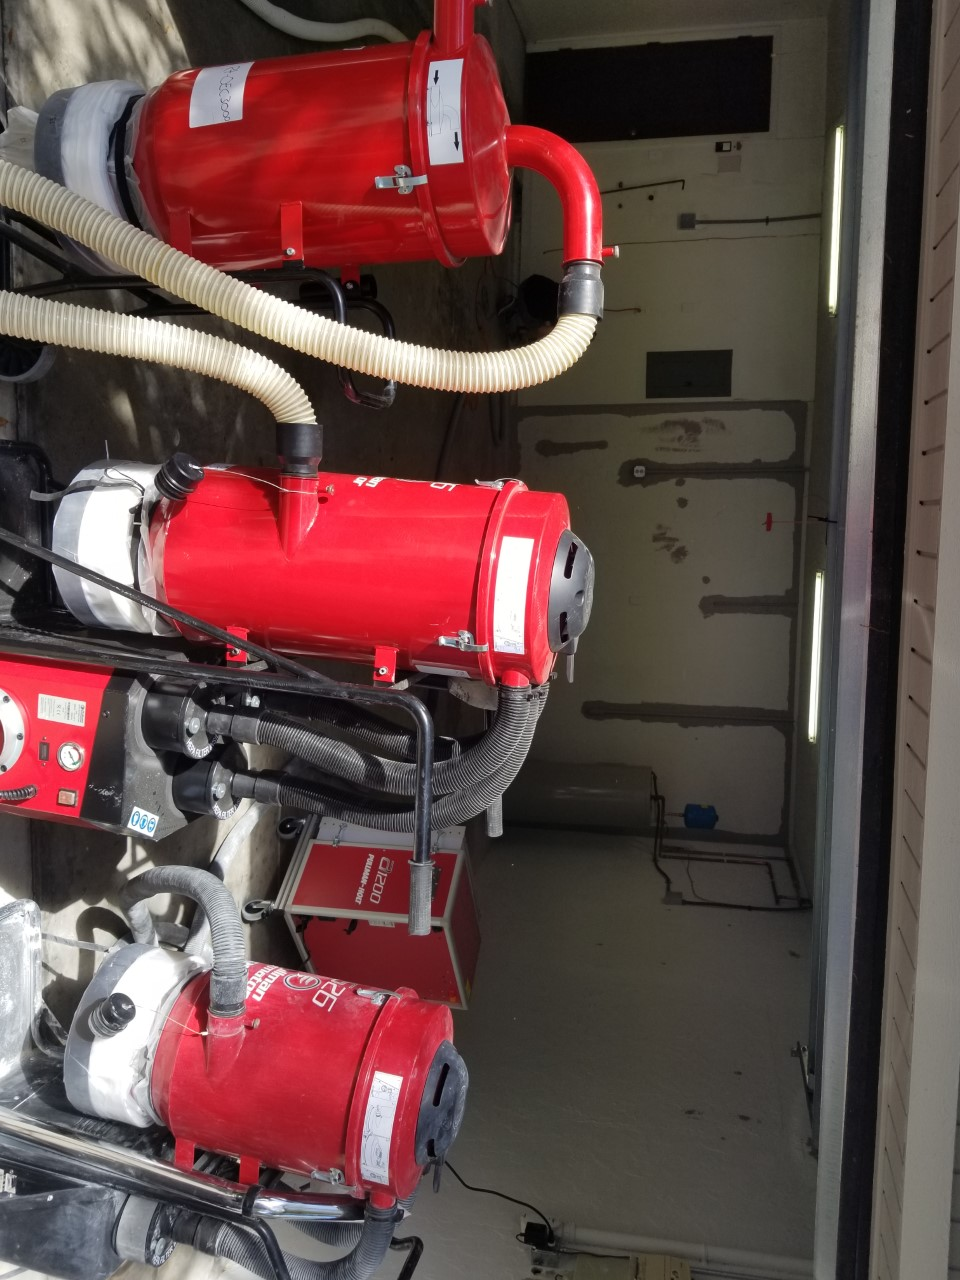 Garage Doctors Easy Clean Flooring in Florida shot-blasting-machine